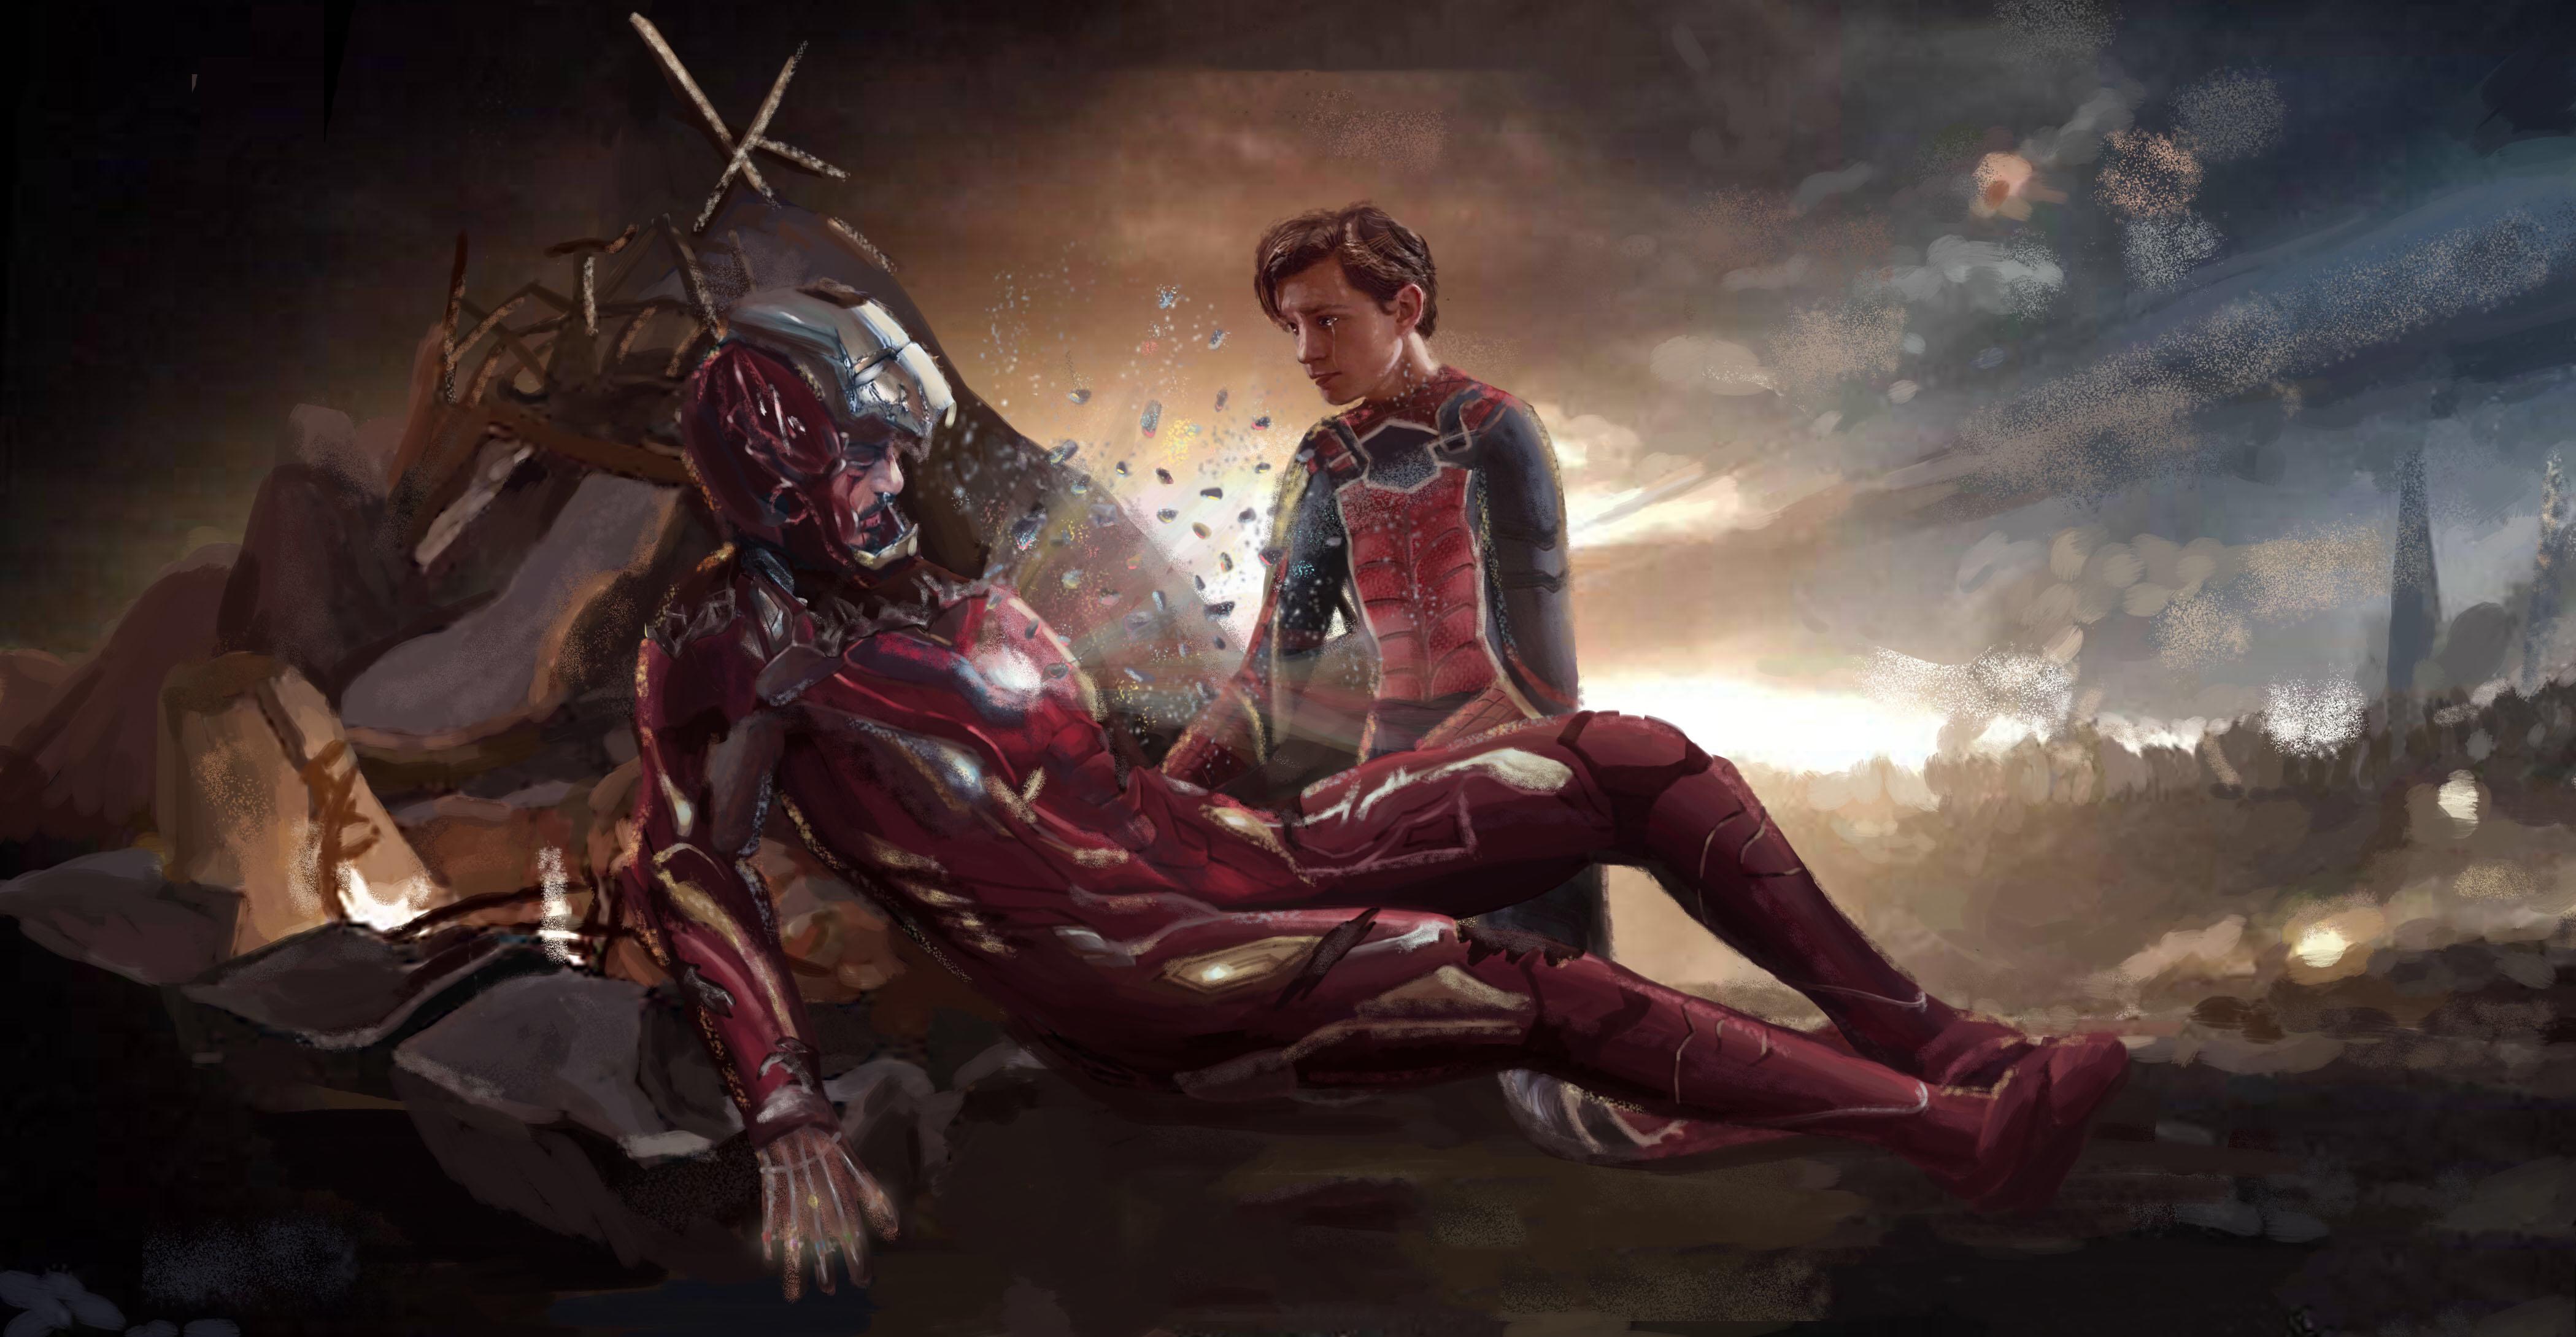 Iron Man And Spiderman Last Scene Art Wallpaper Hd Artist